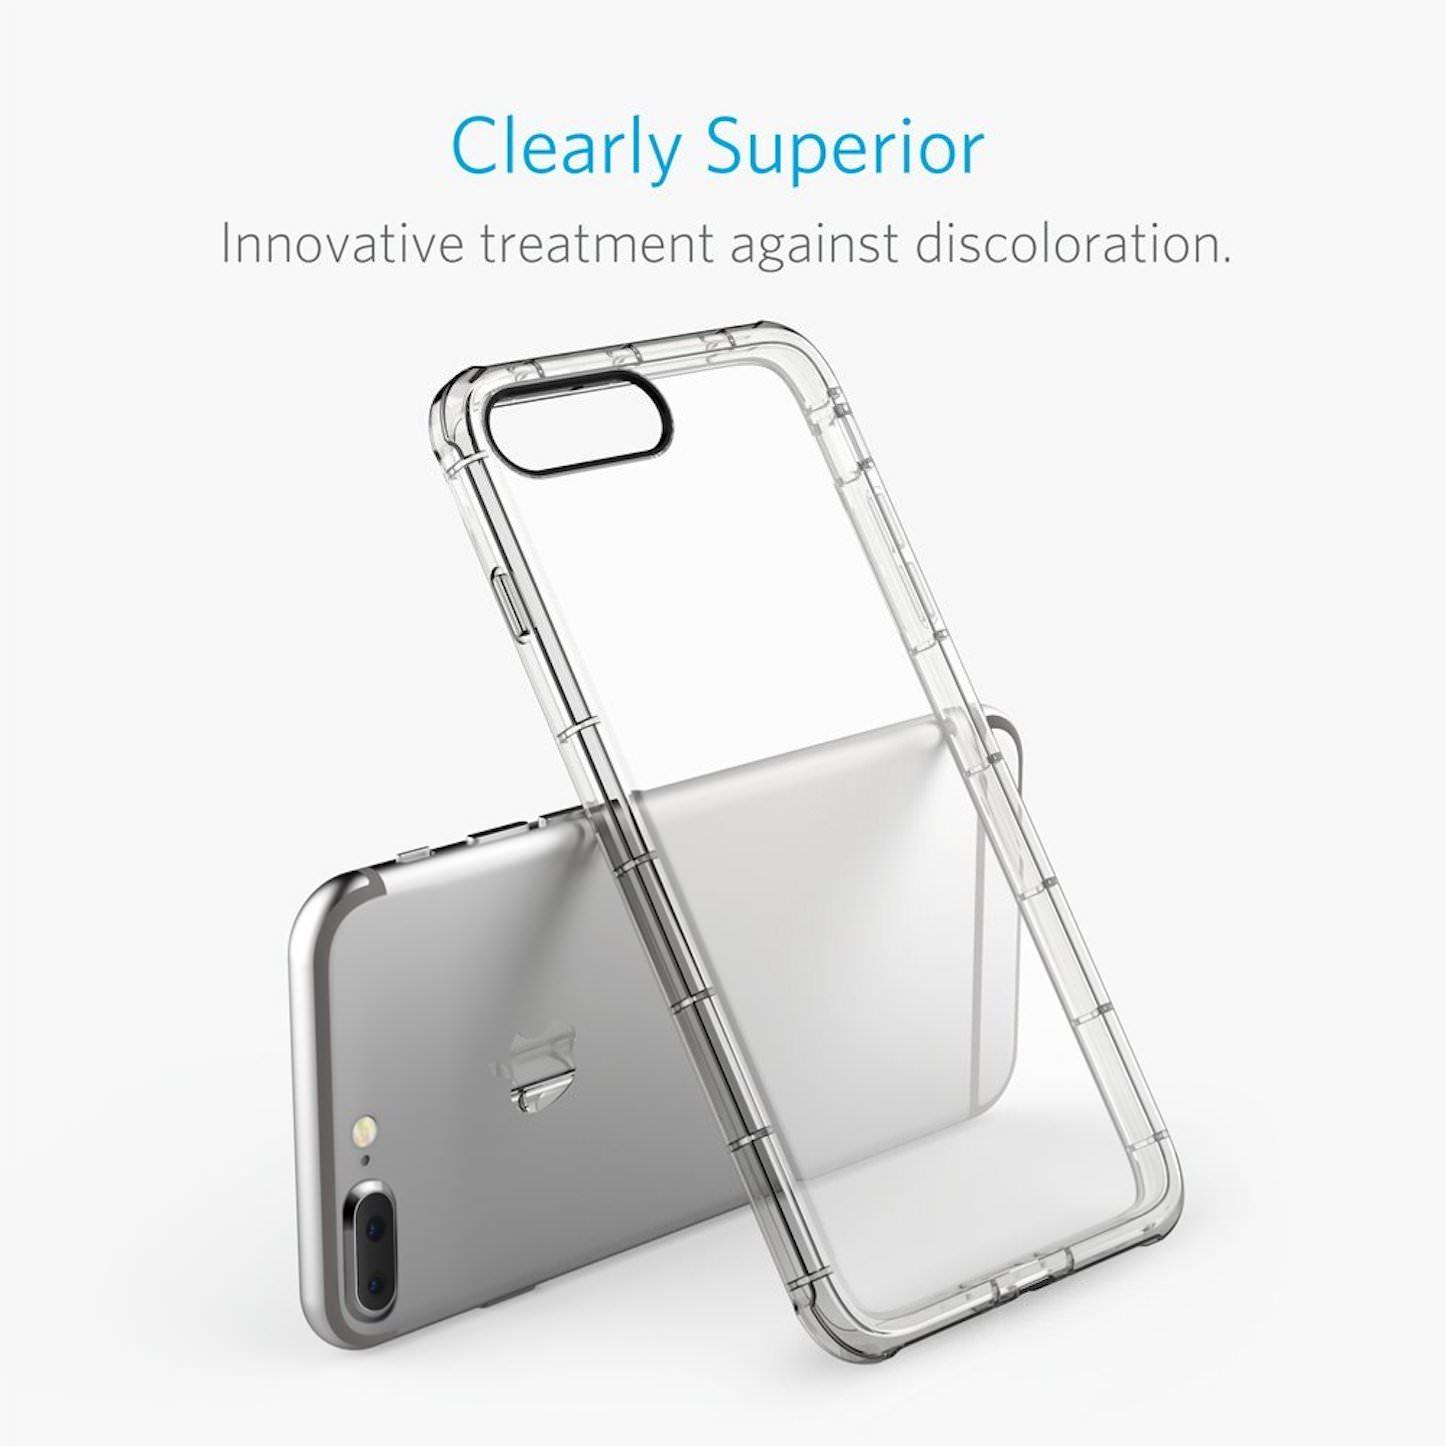 Anker-ToughShell-Air-iphone7plus-3.jpg